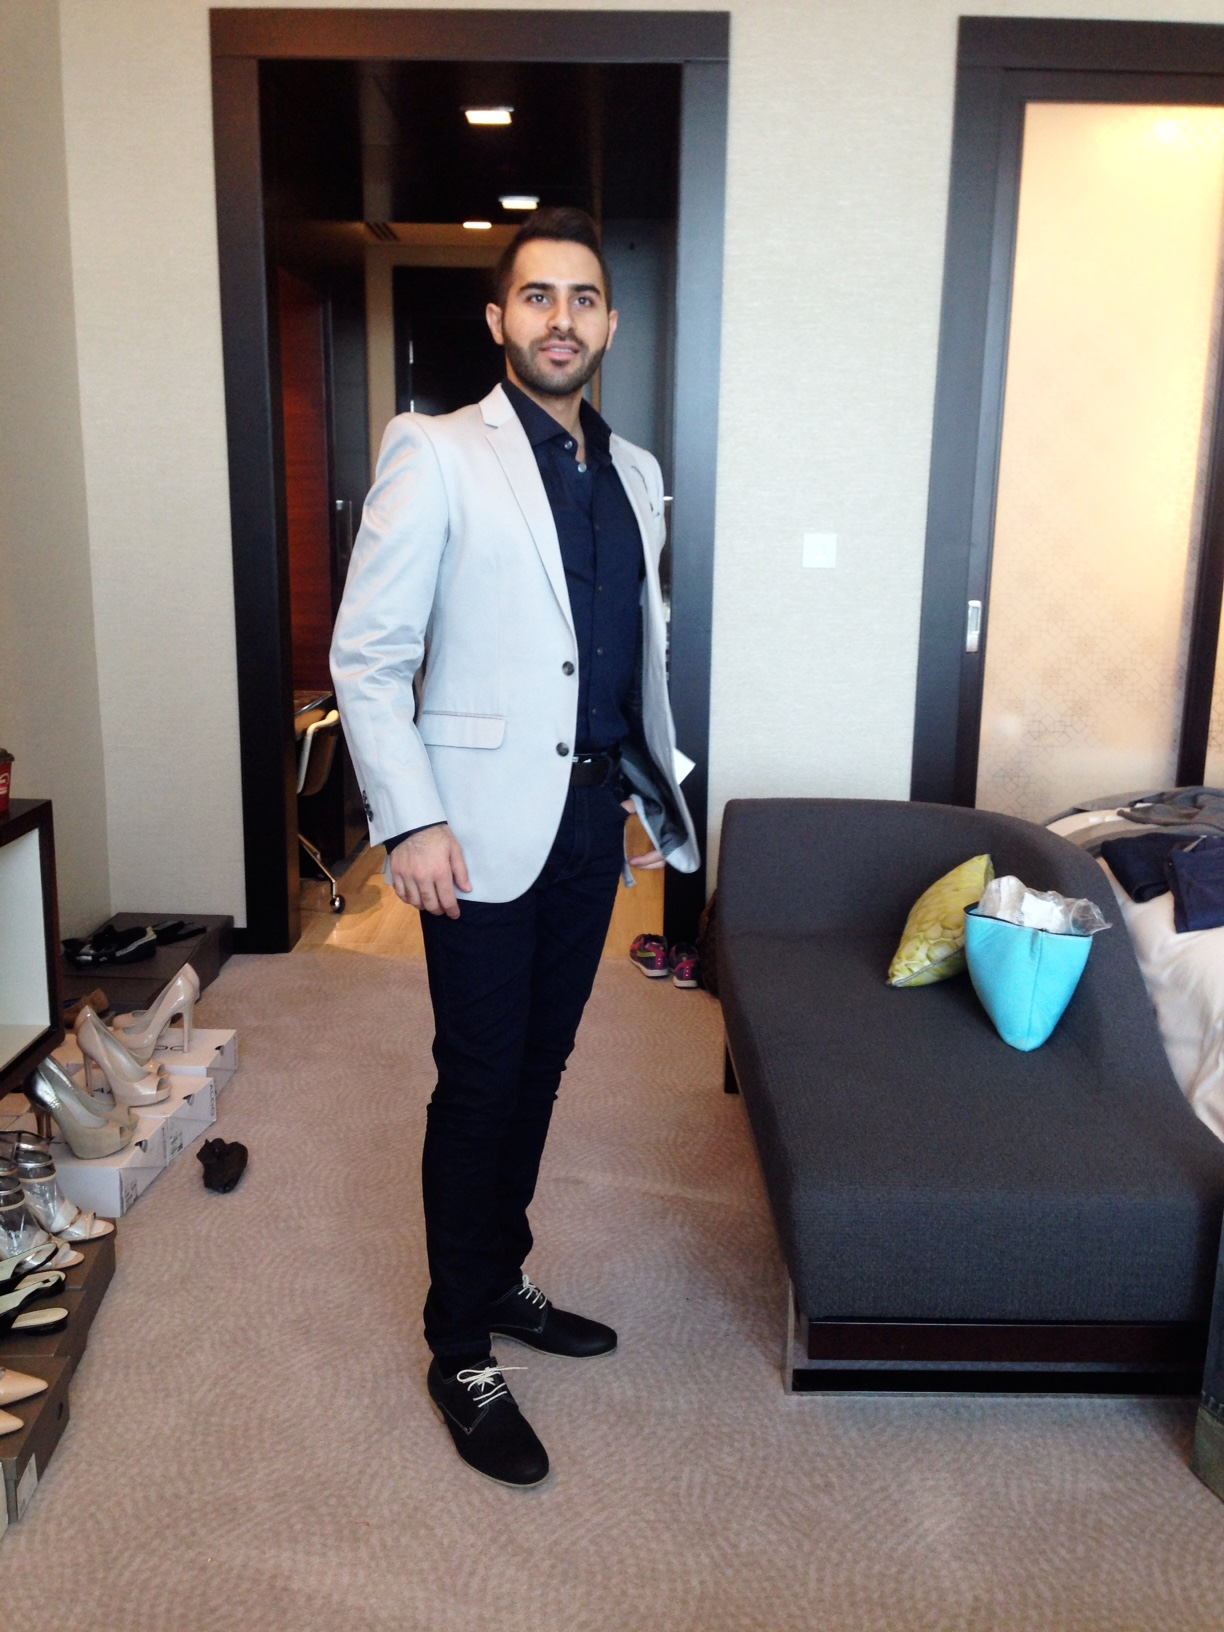 Jacket/Shirt/Jeans - Kenneth Cole, Belt - Aldo, Shoes - Pedro